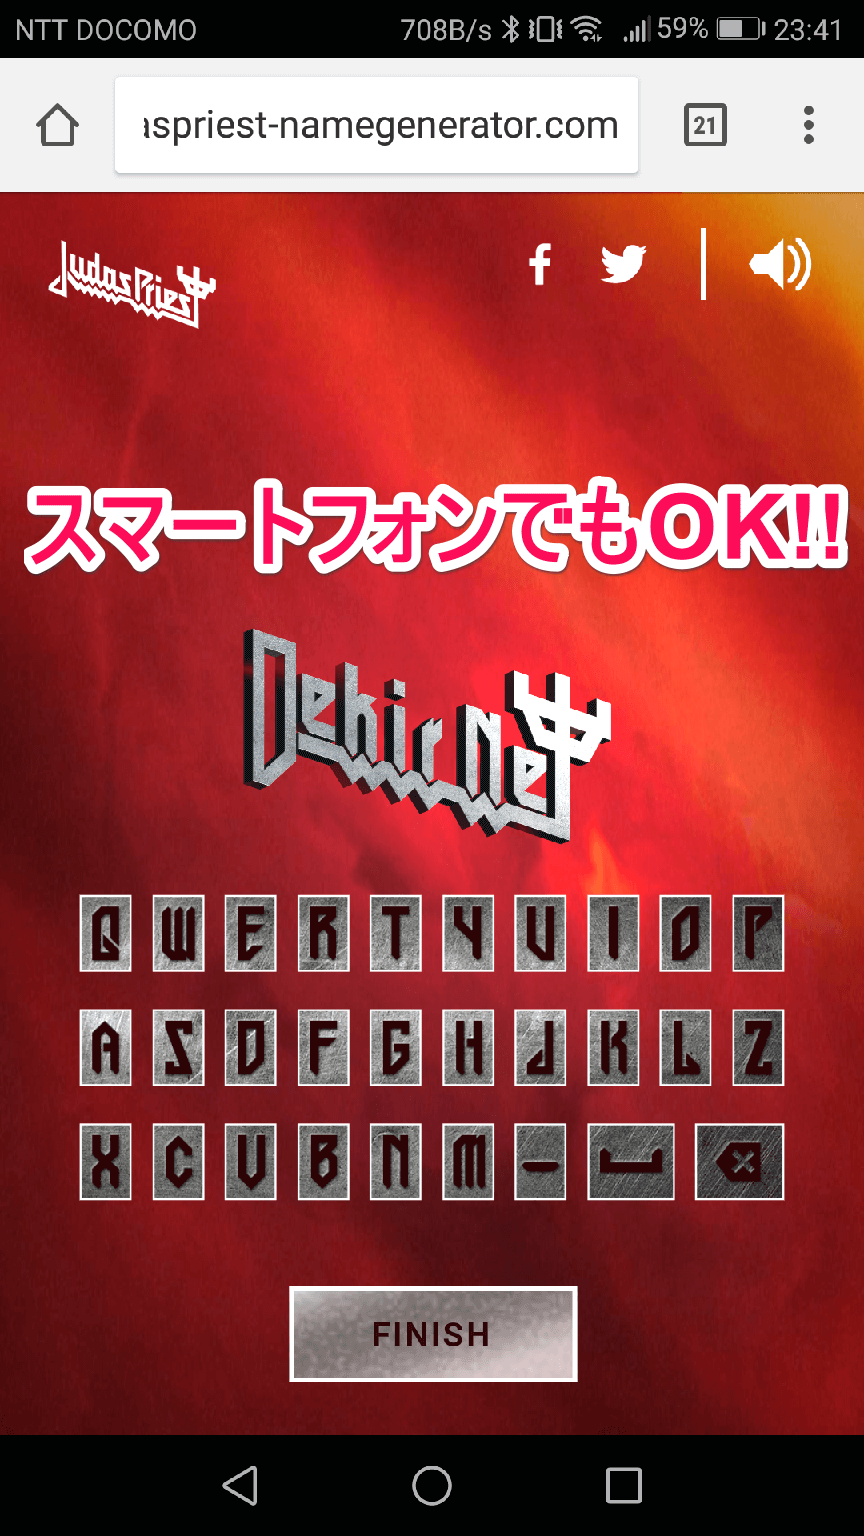 [Judas Priest Name Generator]のスマートフォン版(画面はアンドロイド版)の画面